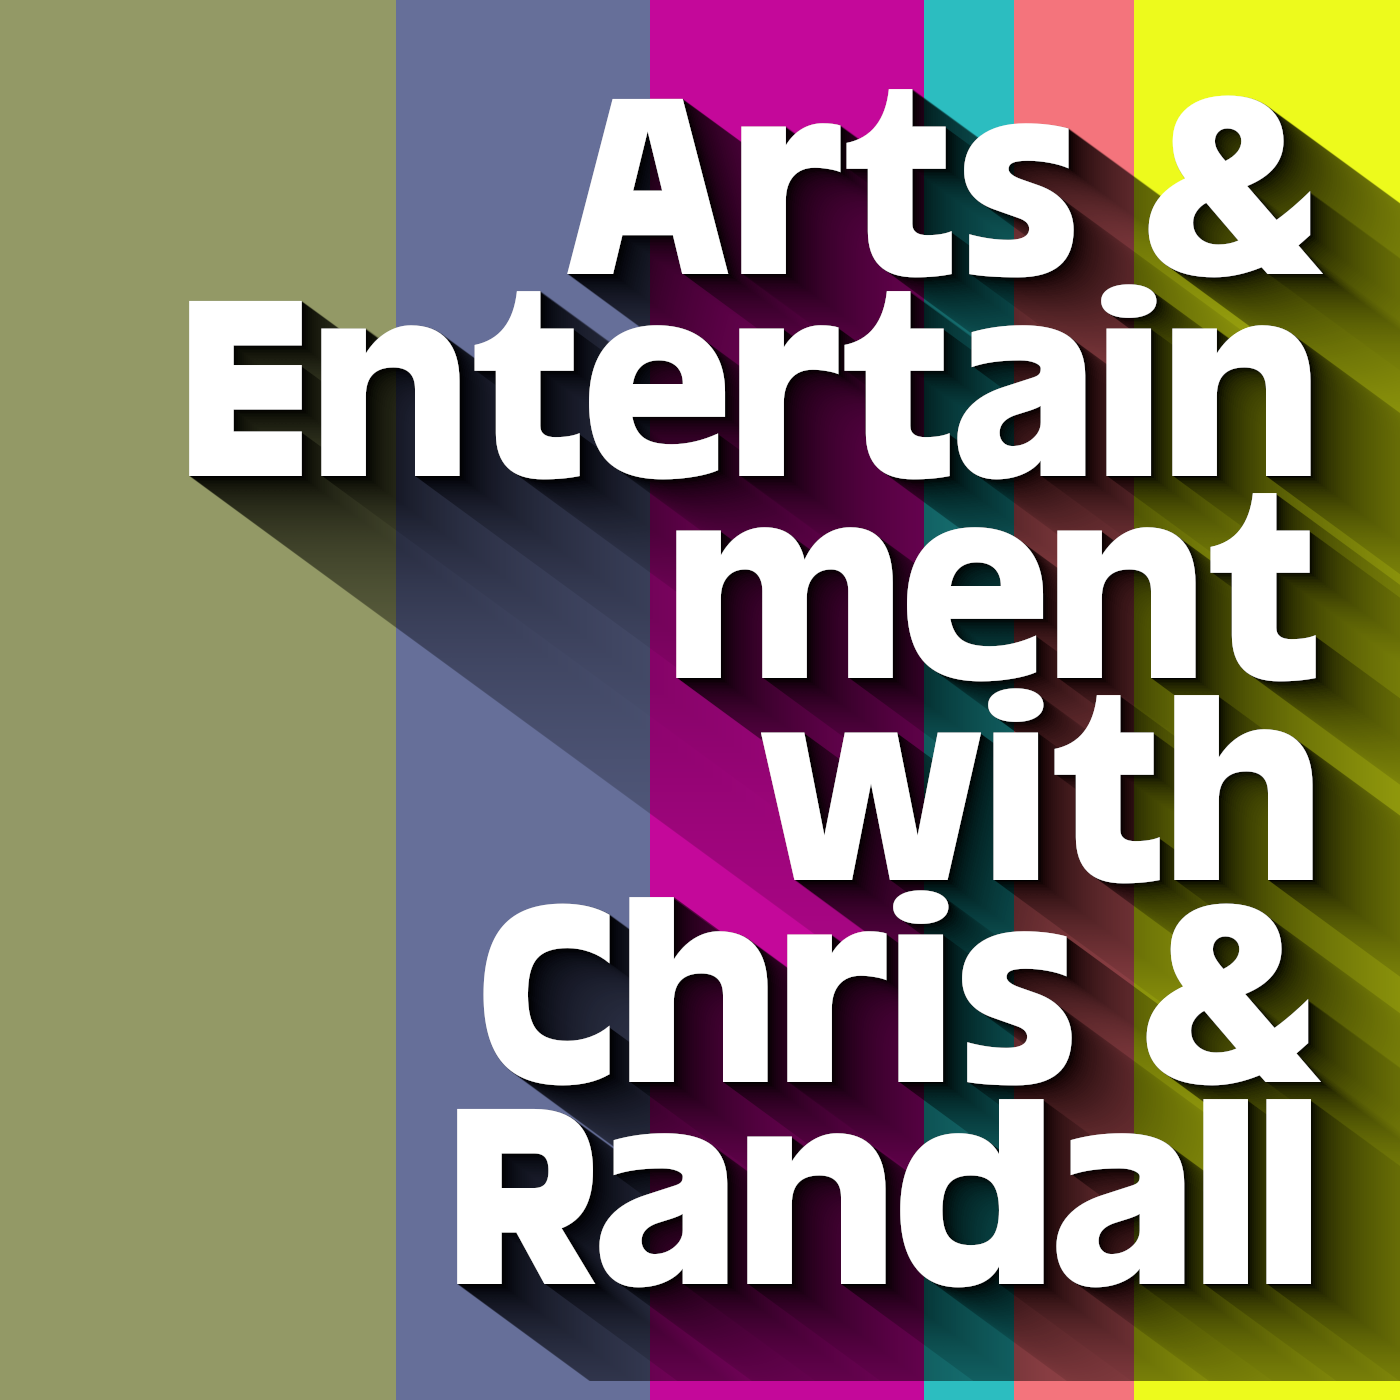 Arts & Entertainment with Chris & Randall show art